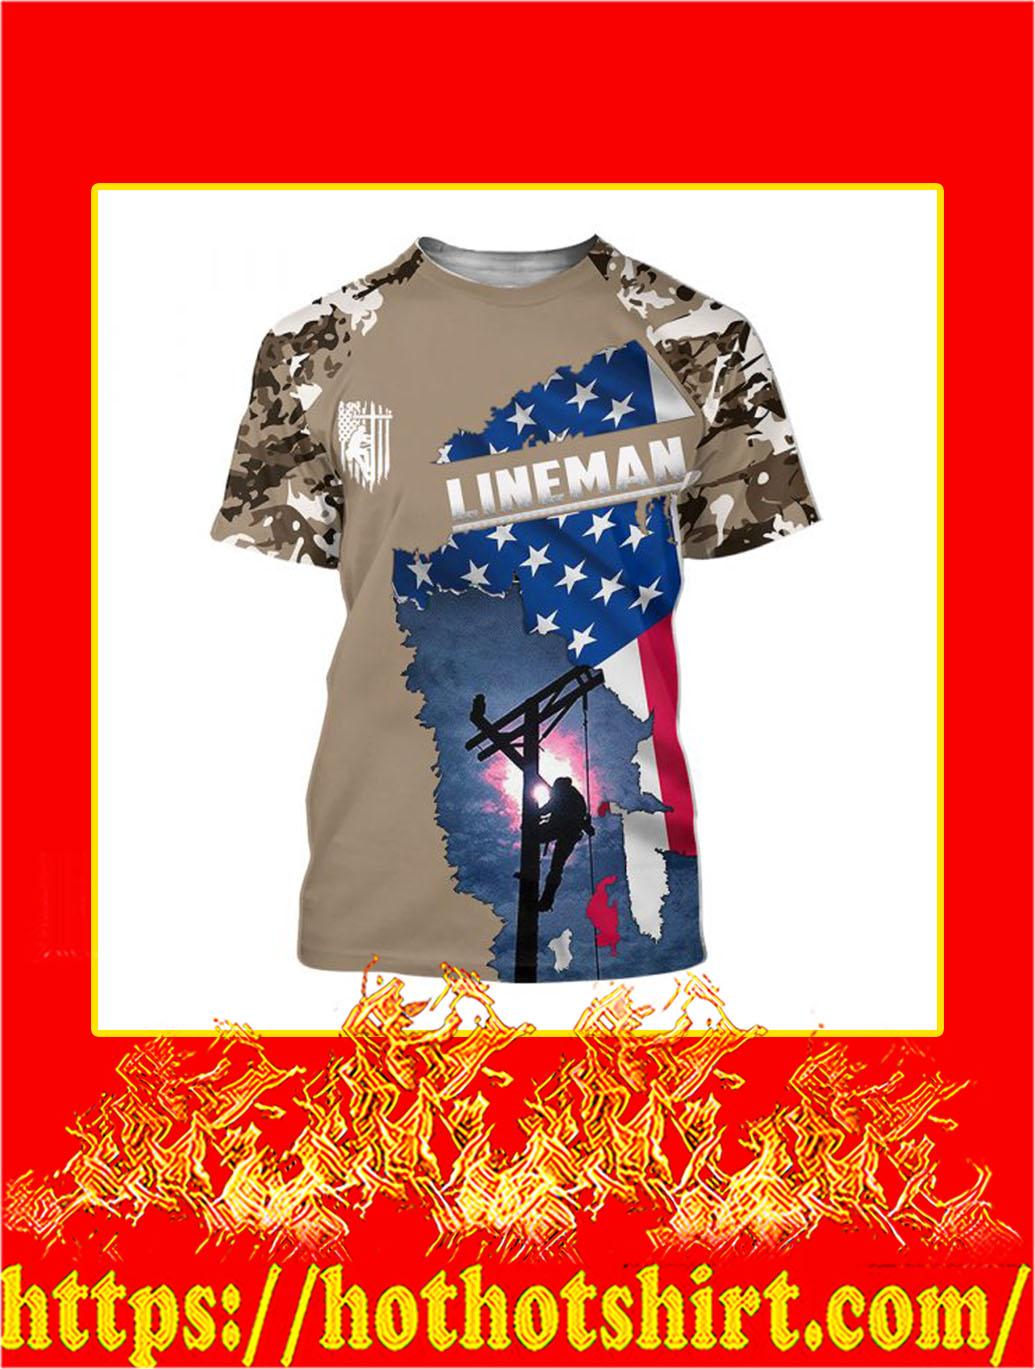 3D Printed Lineman Clothing American Flag Camo T-shirt